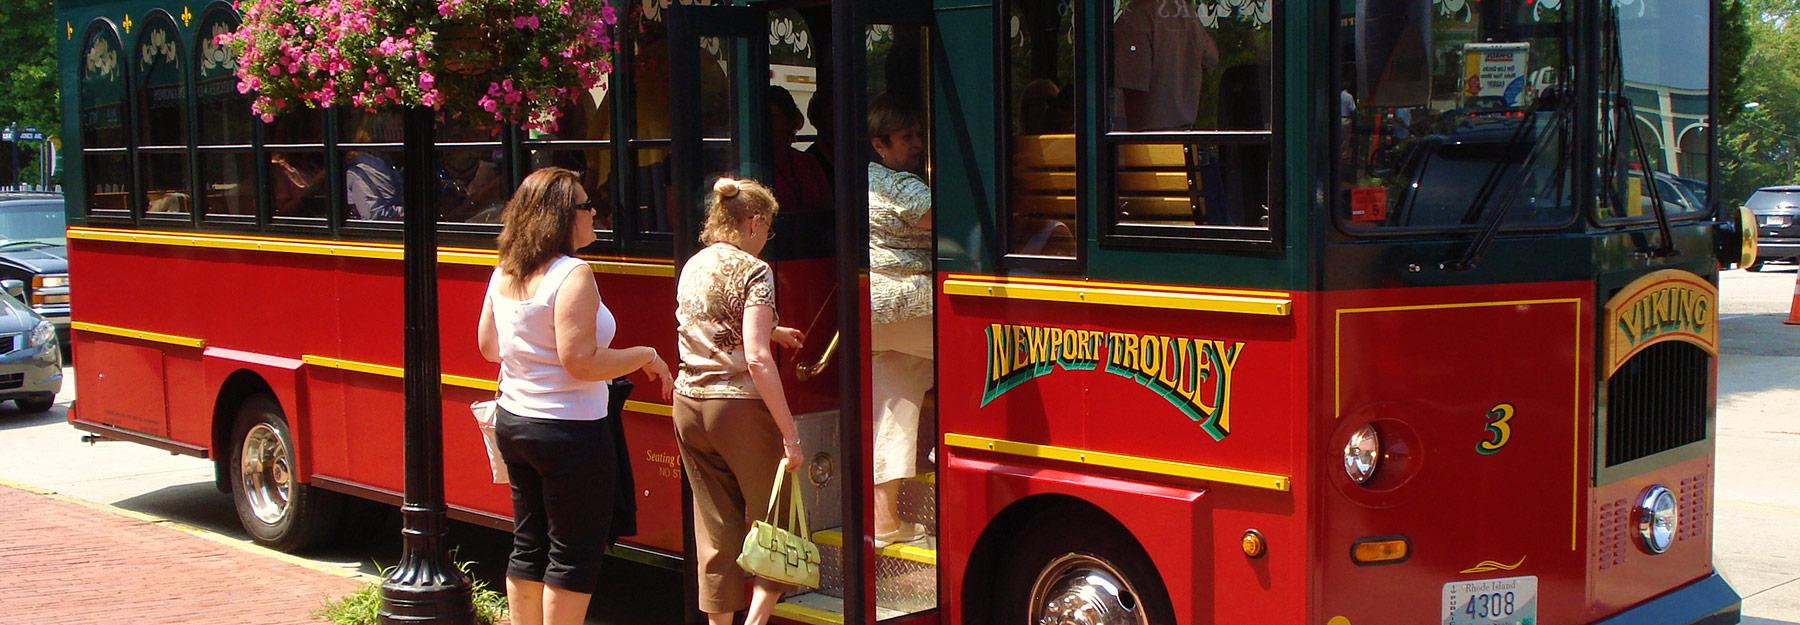 viking-tours-newport-trolley-tours-01